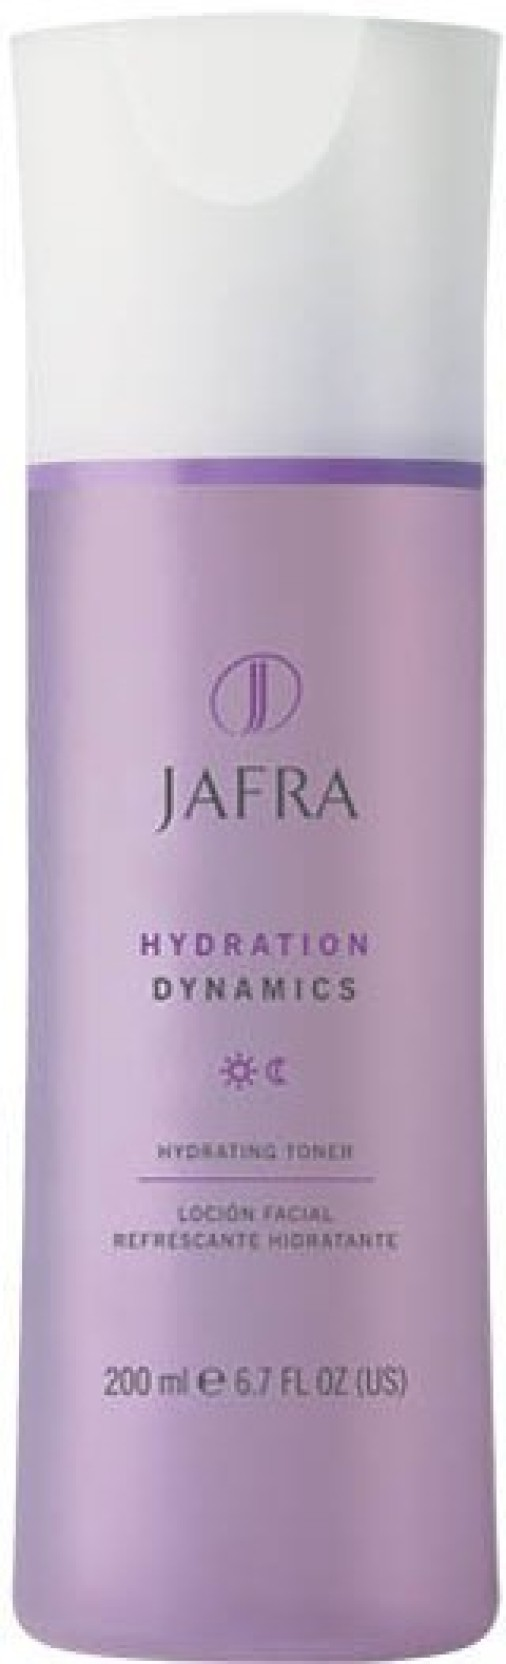 Jafra Hydrating Toner Price In India Buy Night Moisture Share